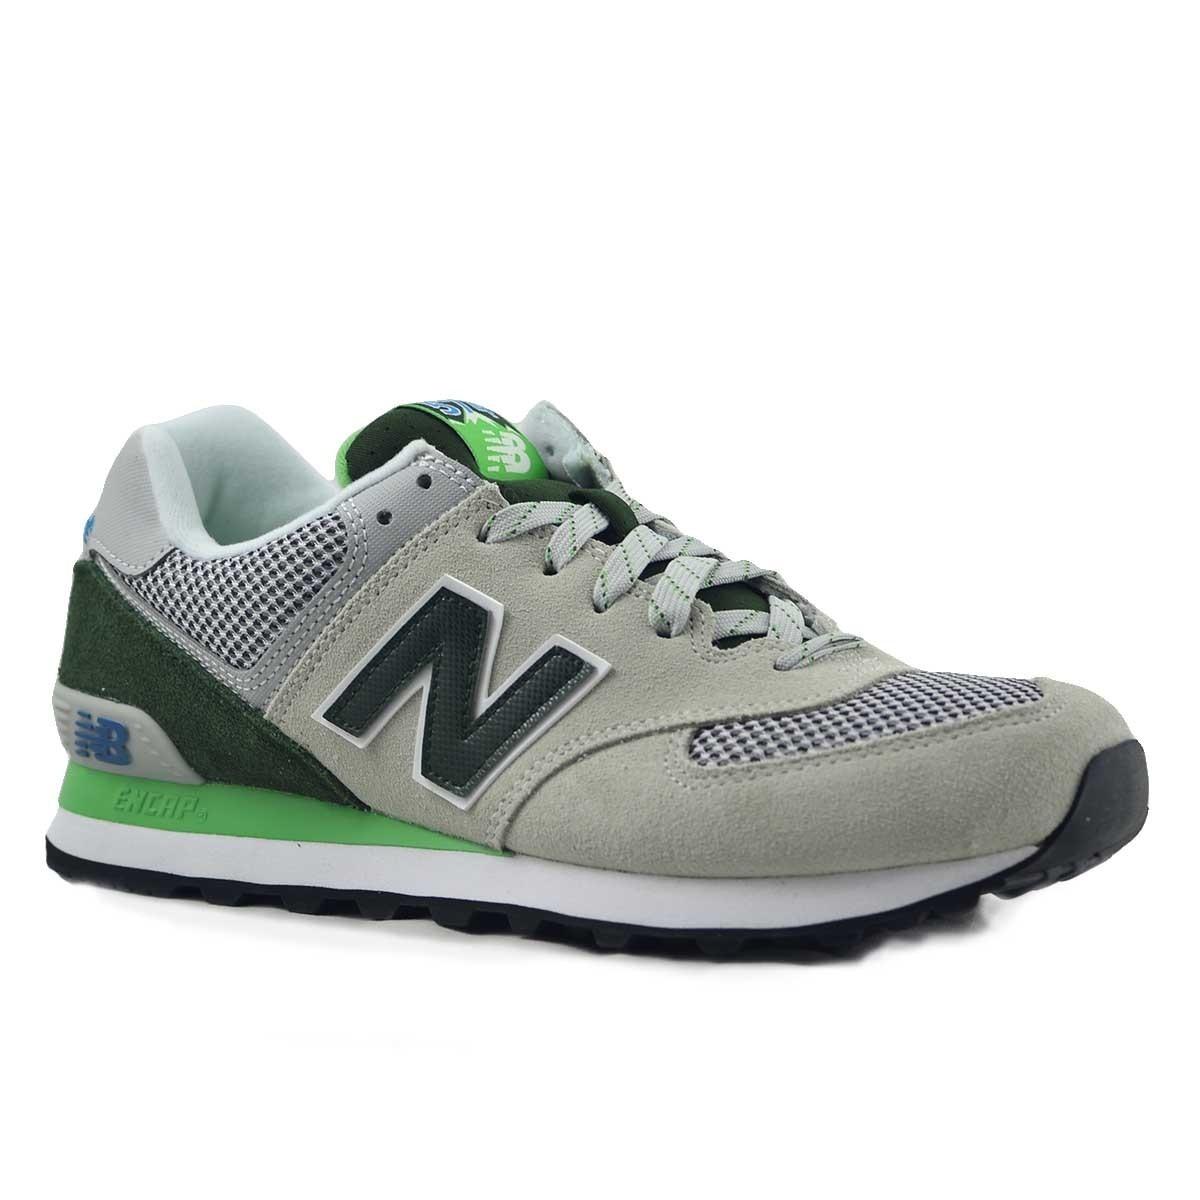 new balance 574 gris verde